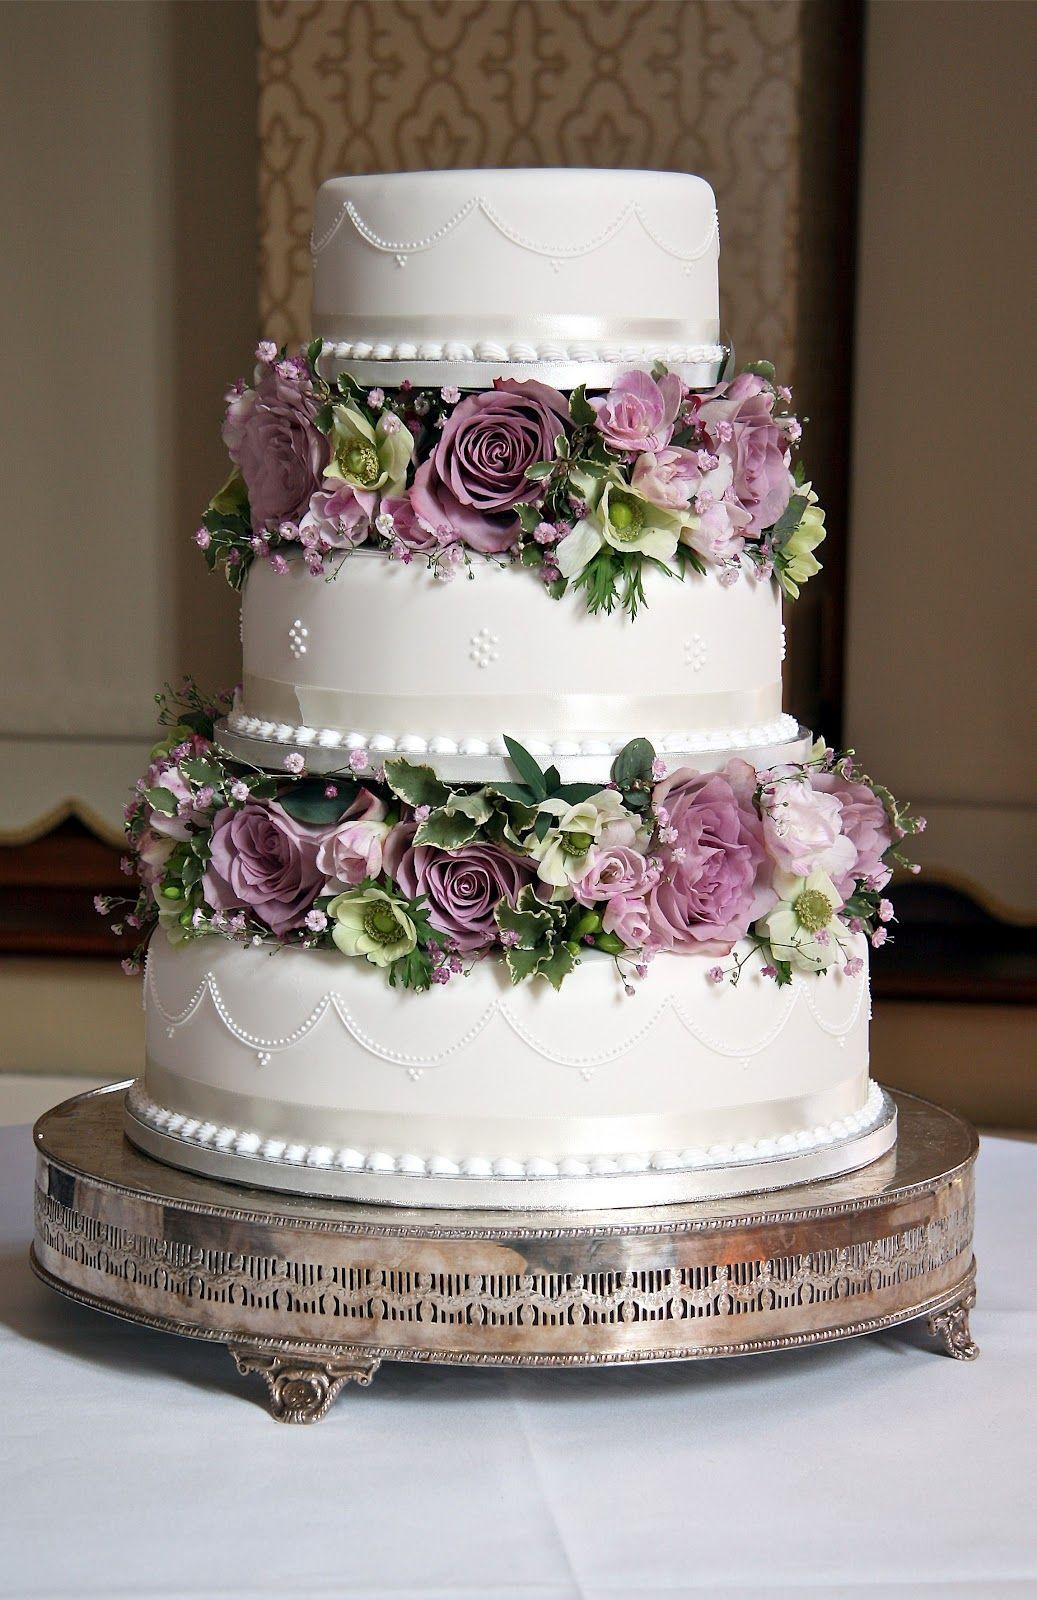 Antique Wedding Bouquets Vintage styled wedding cake